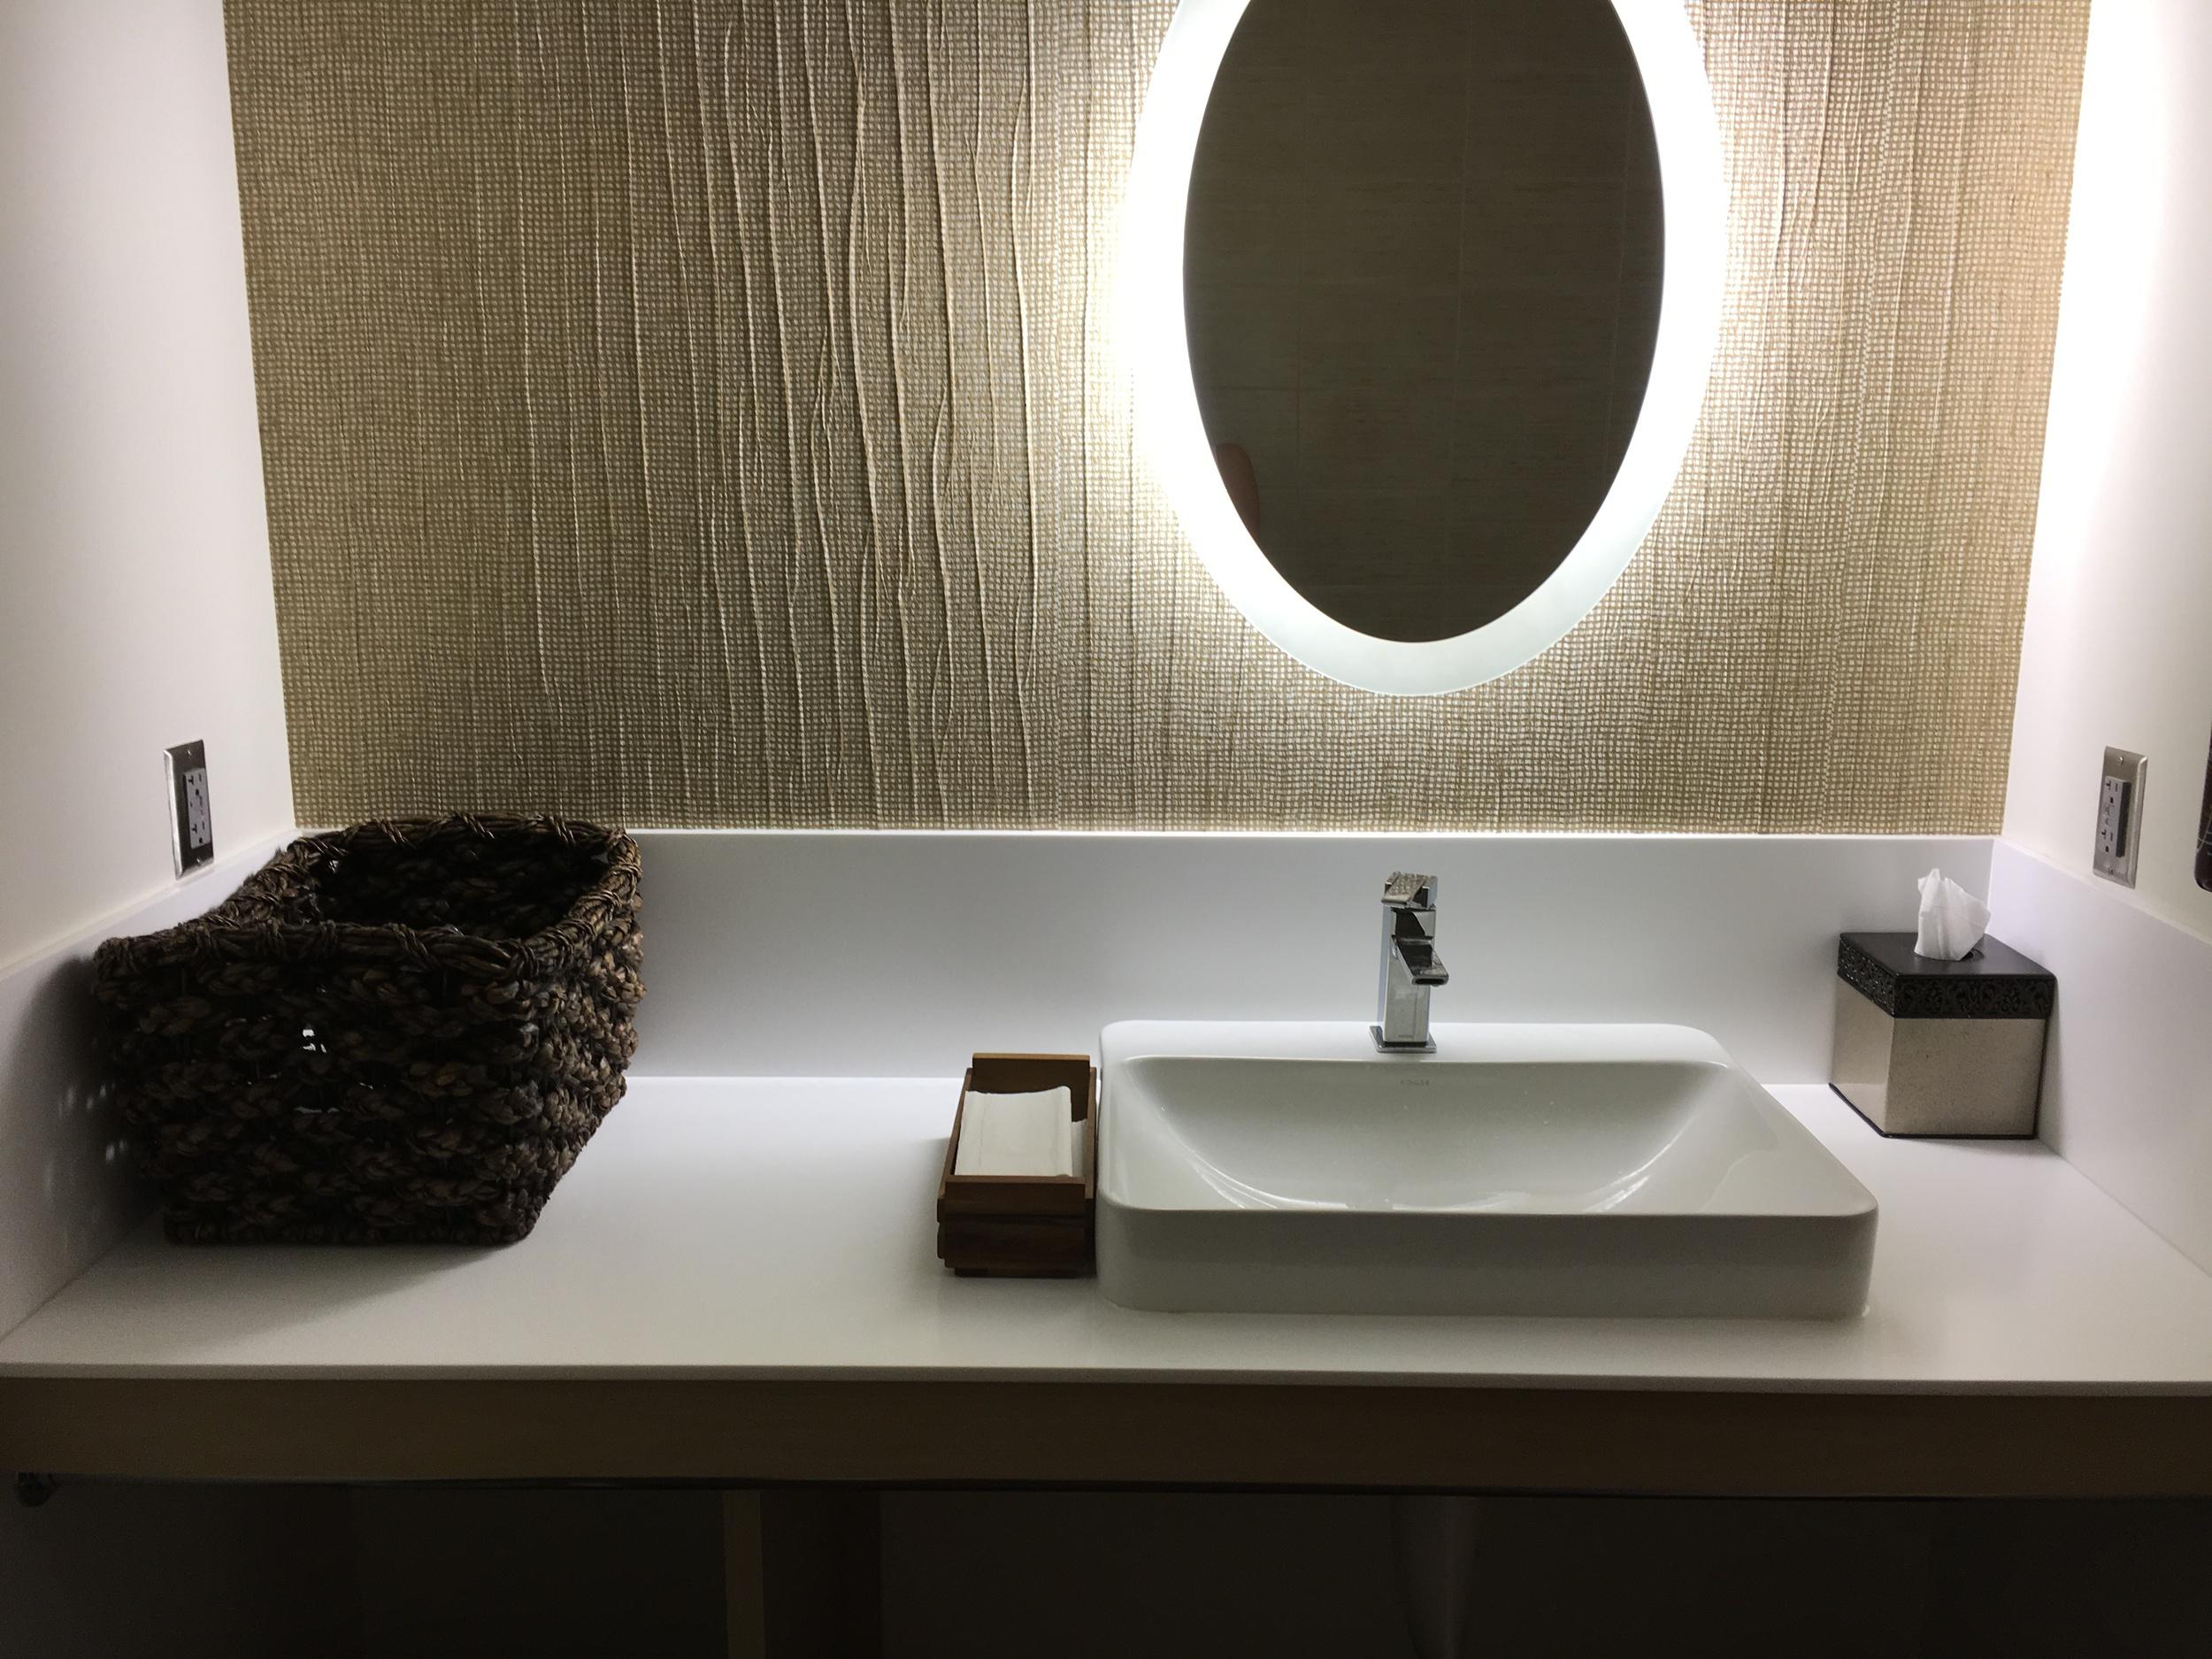 Exhale Virginia Highlands Bathroom (Friedrich).JPG